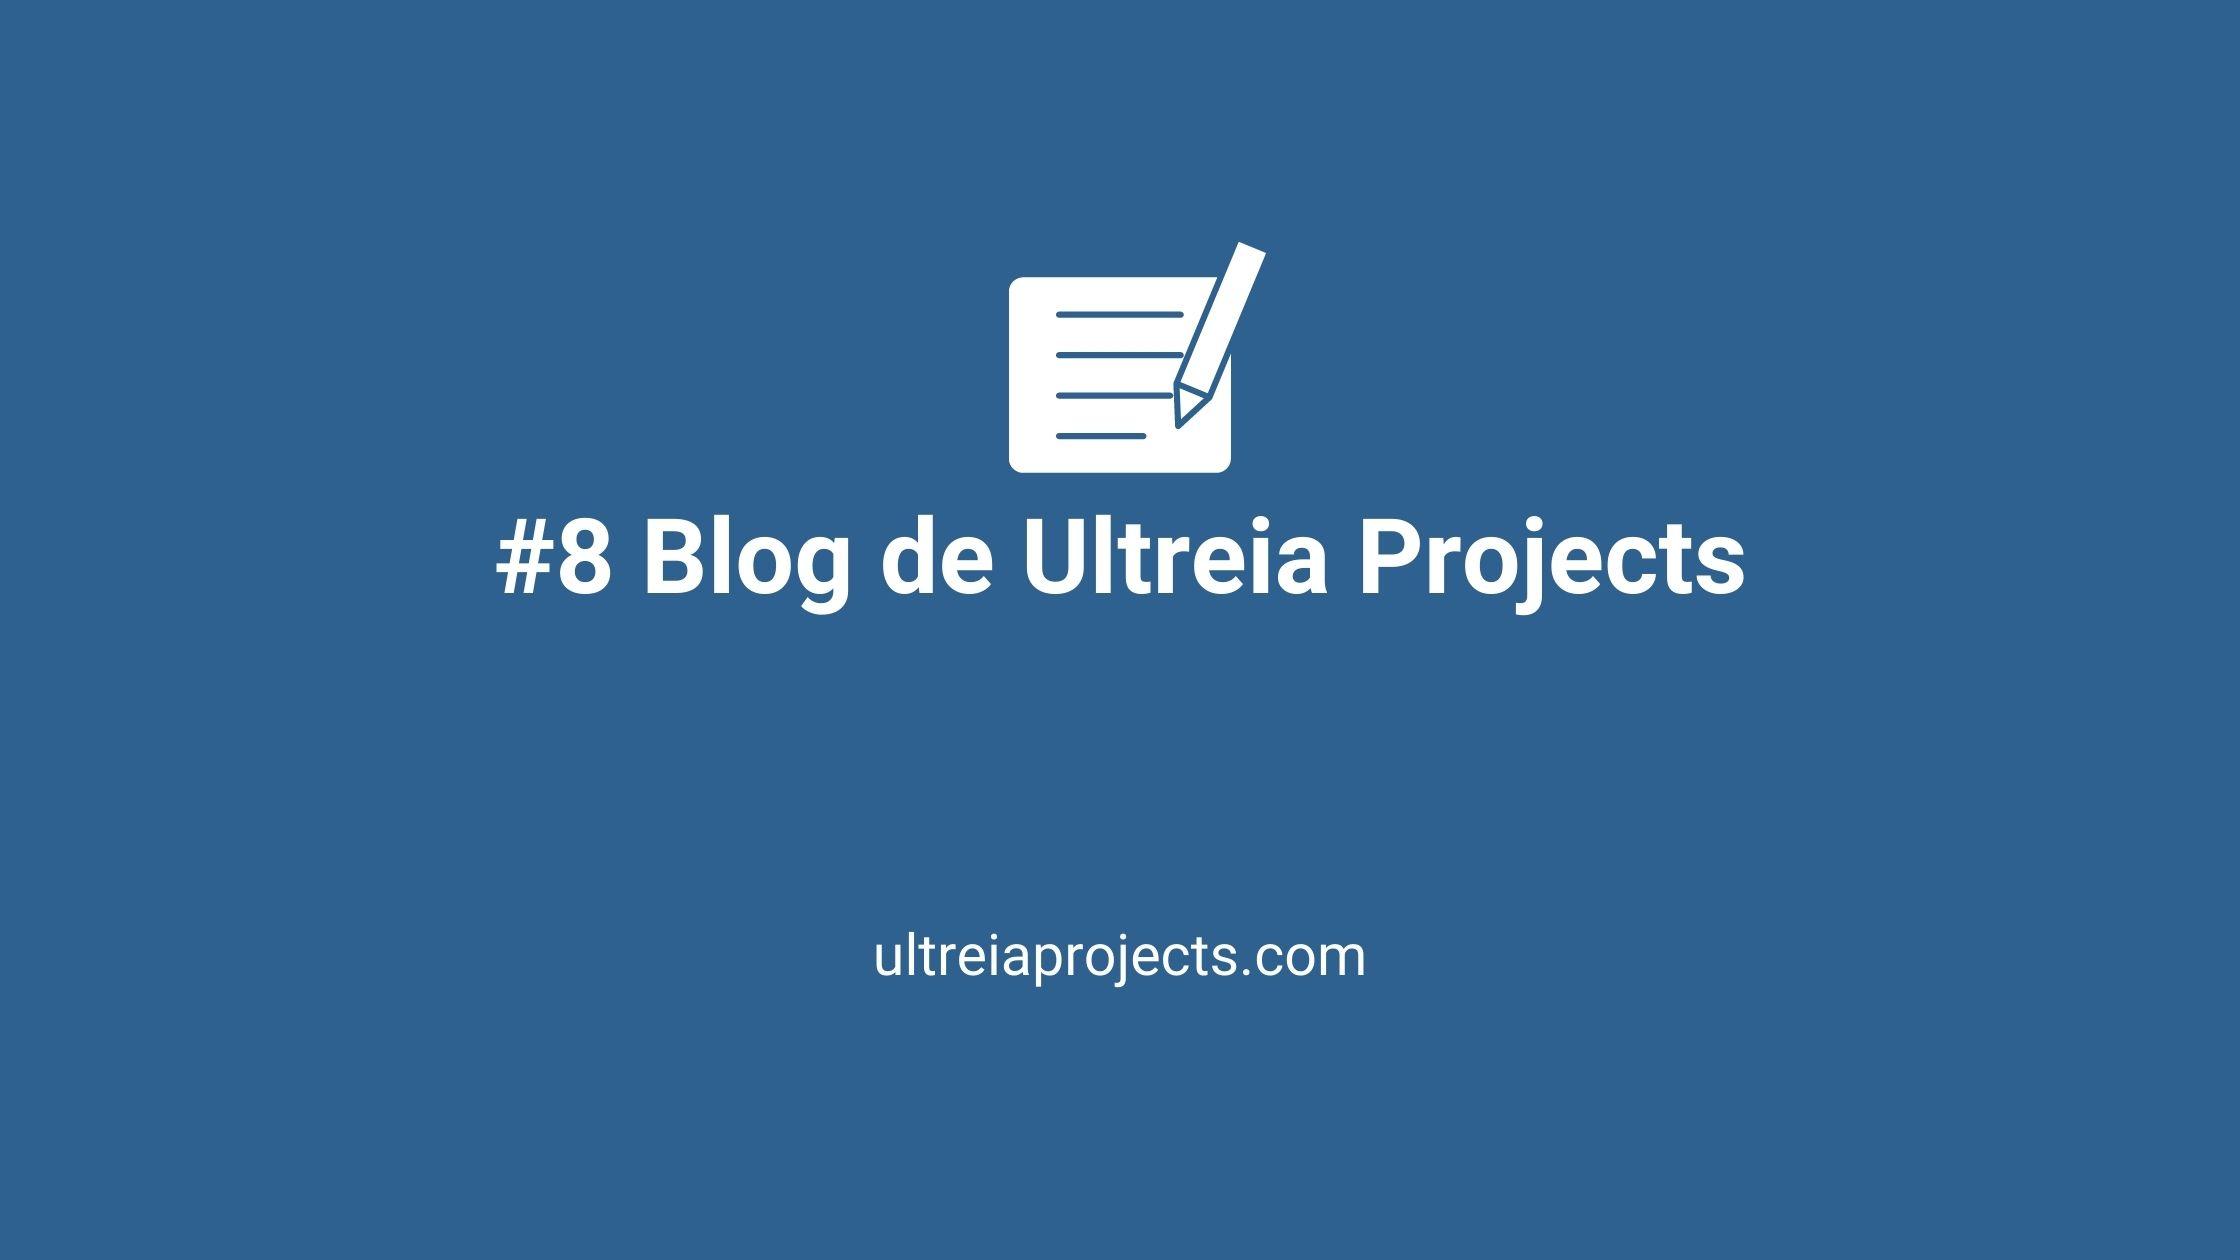 Blog de Ultreia Projects